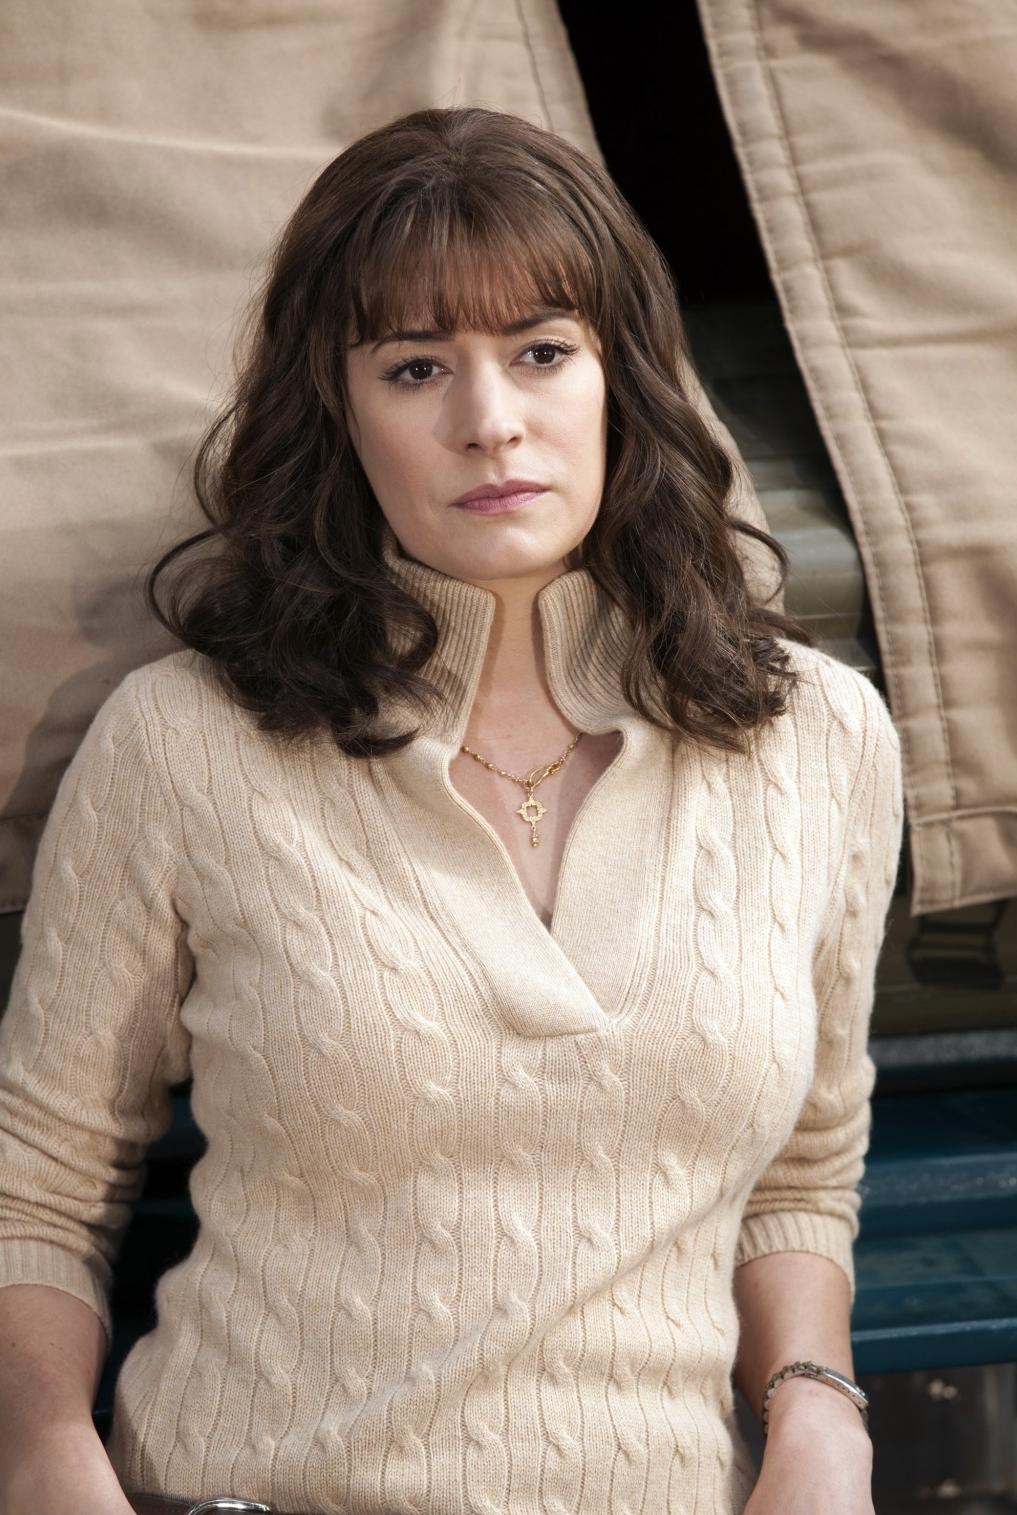 Emily Prentiss Criminal Minds